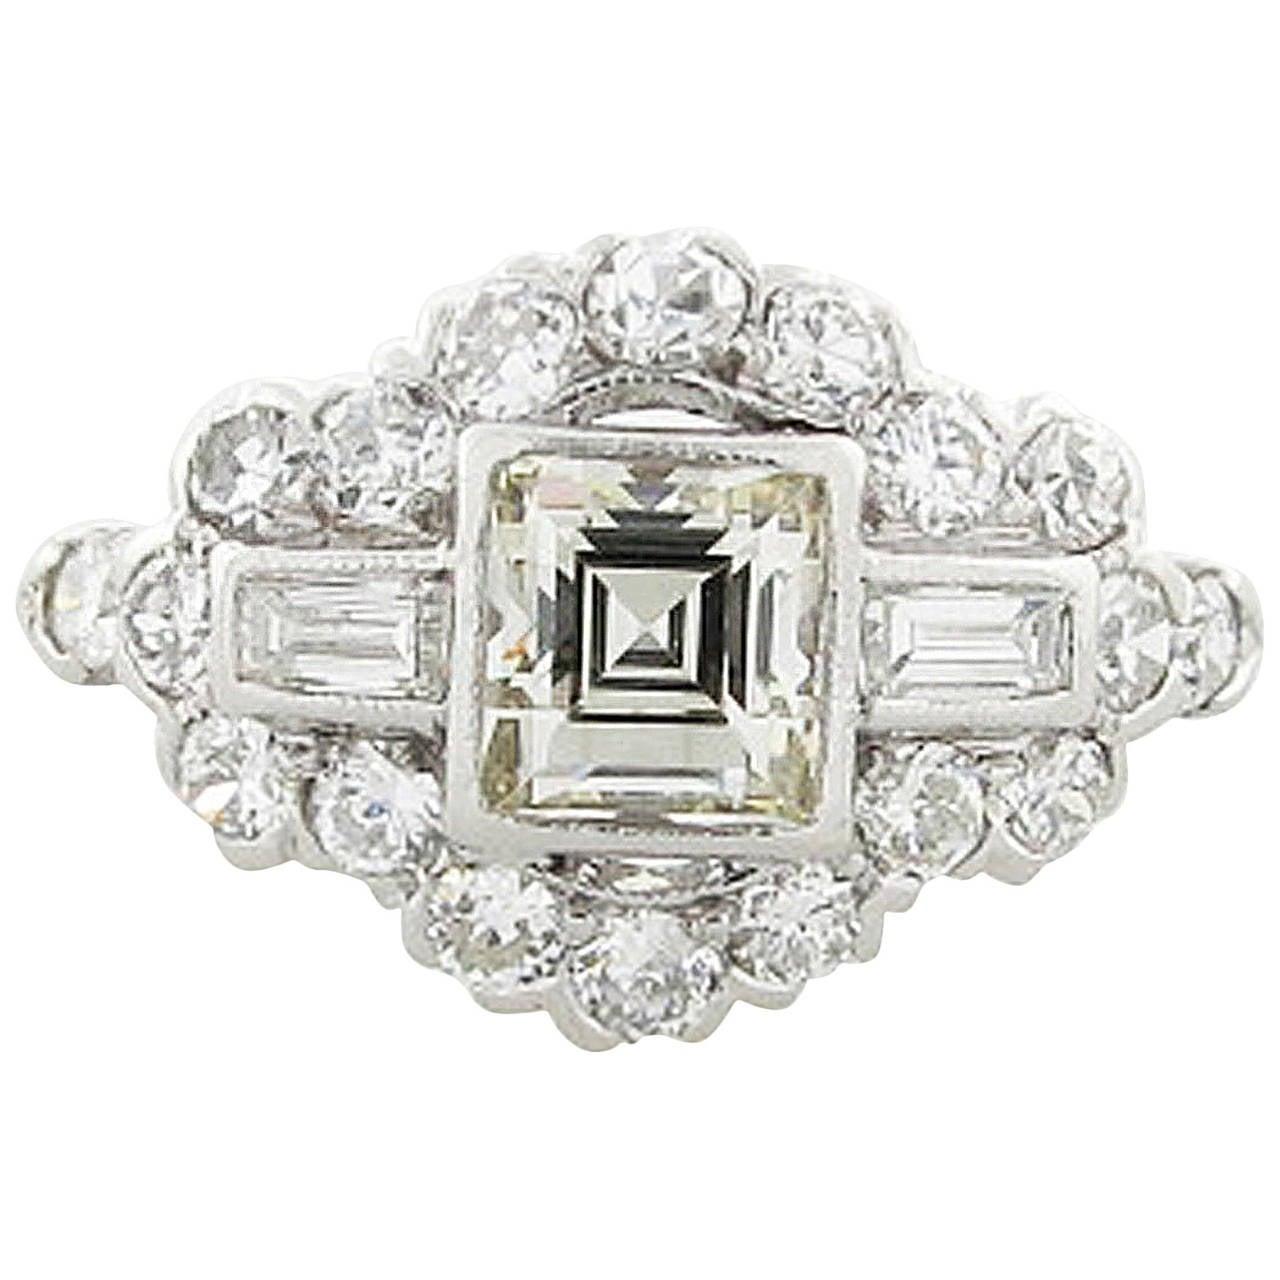 unique platinum art deco square cut diamond ring at 1stdibs. Black Bedroom Furniture Sets. Home Design Ideas